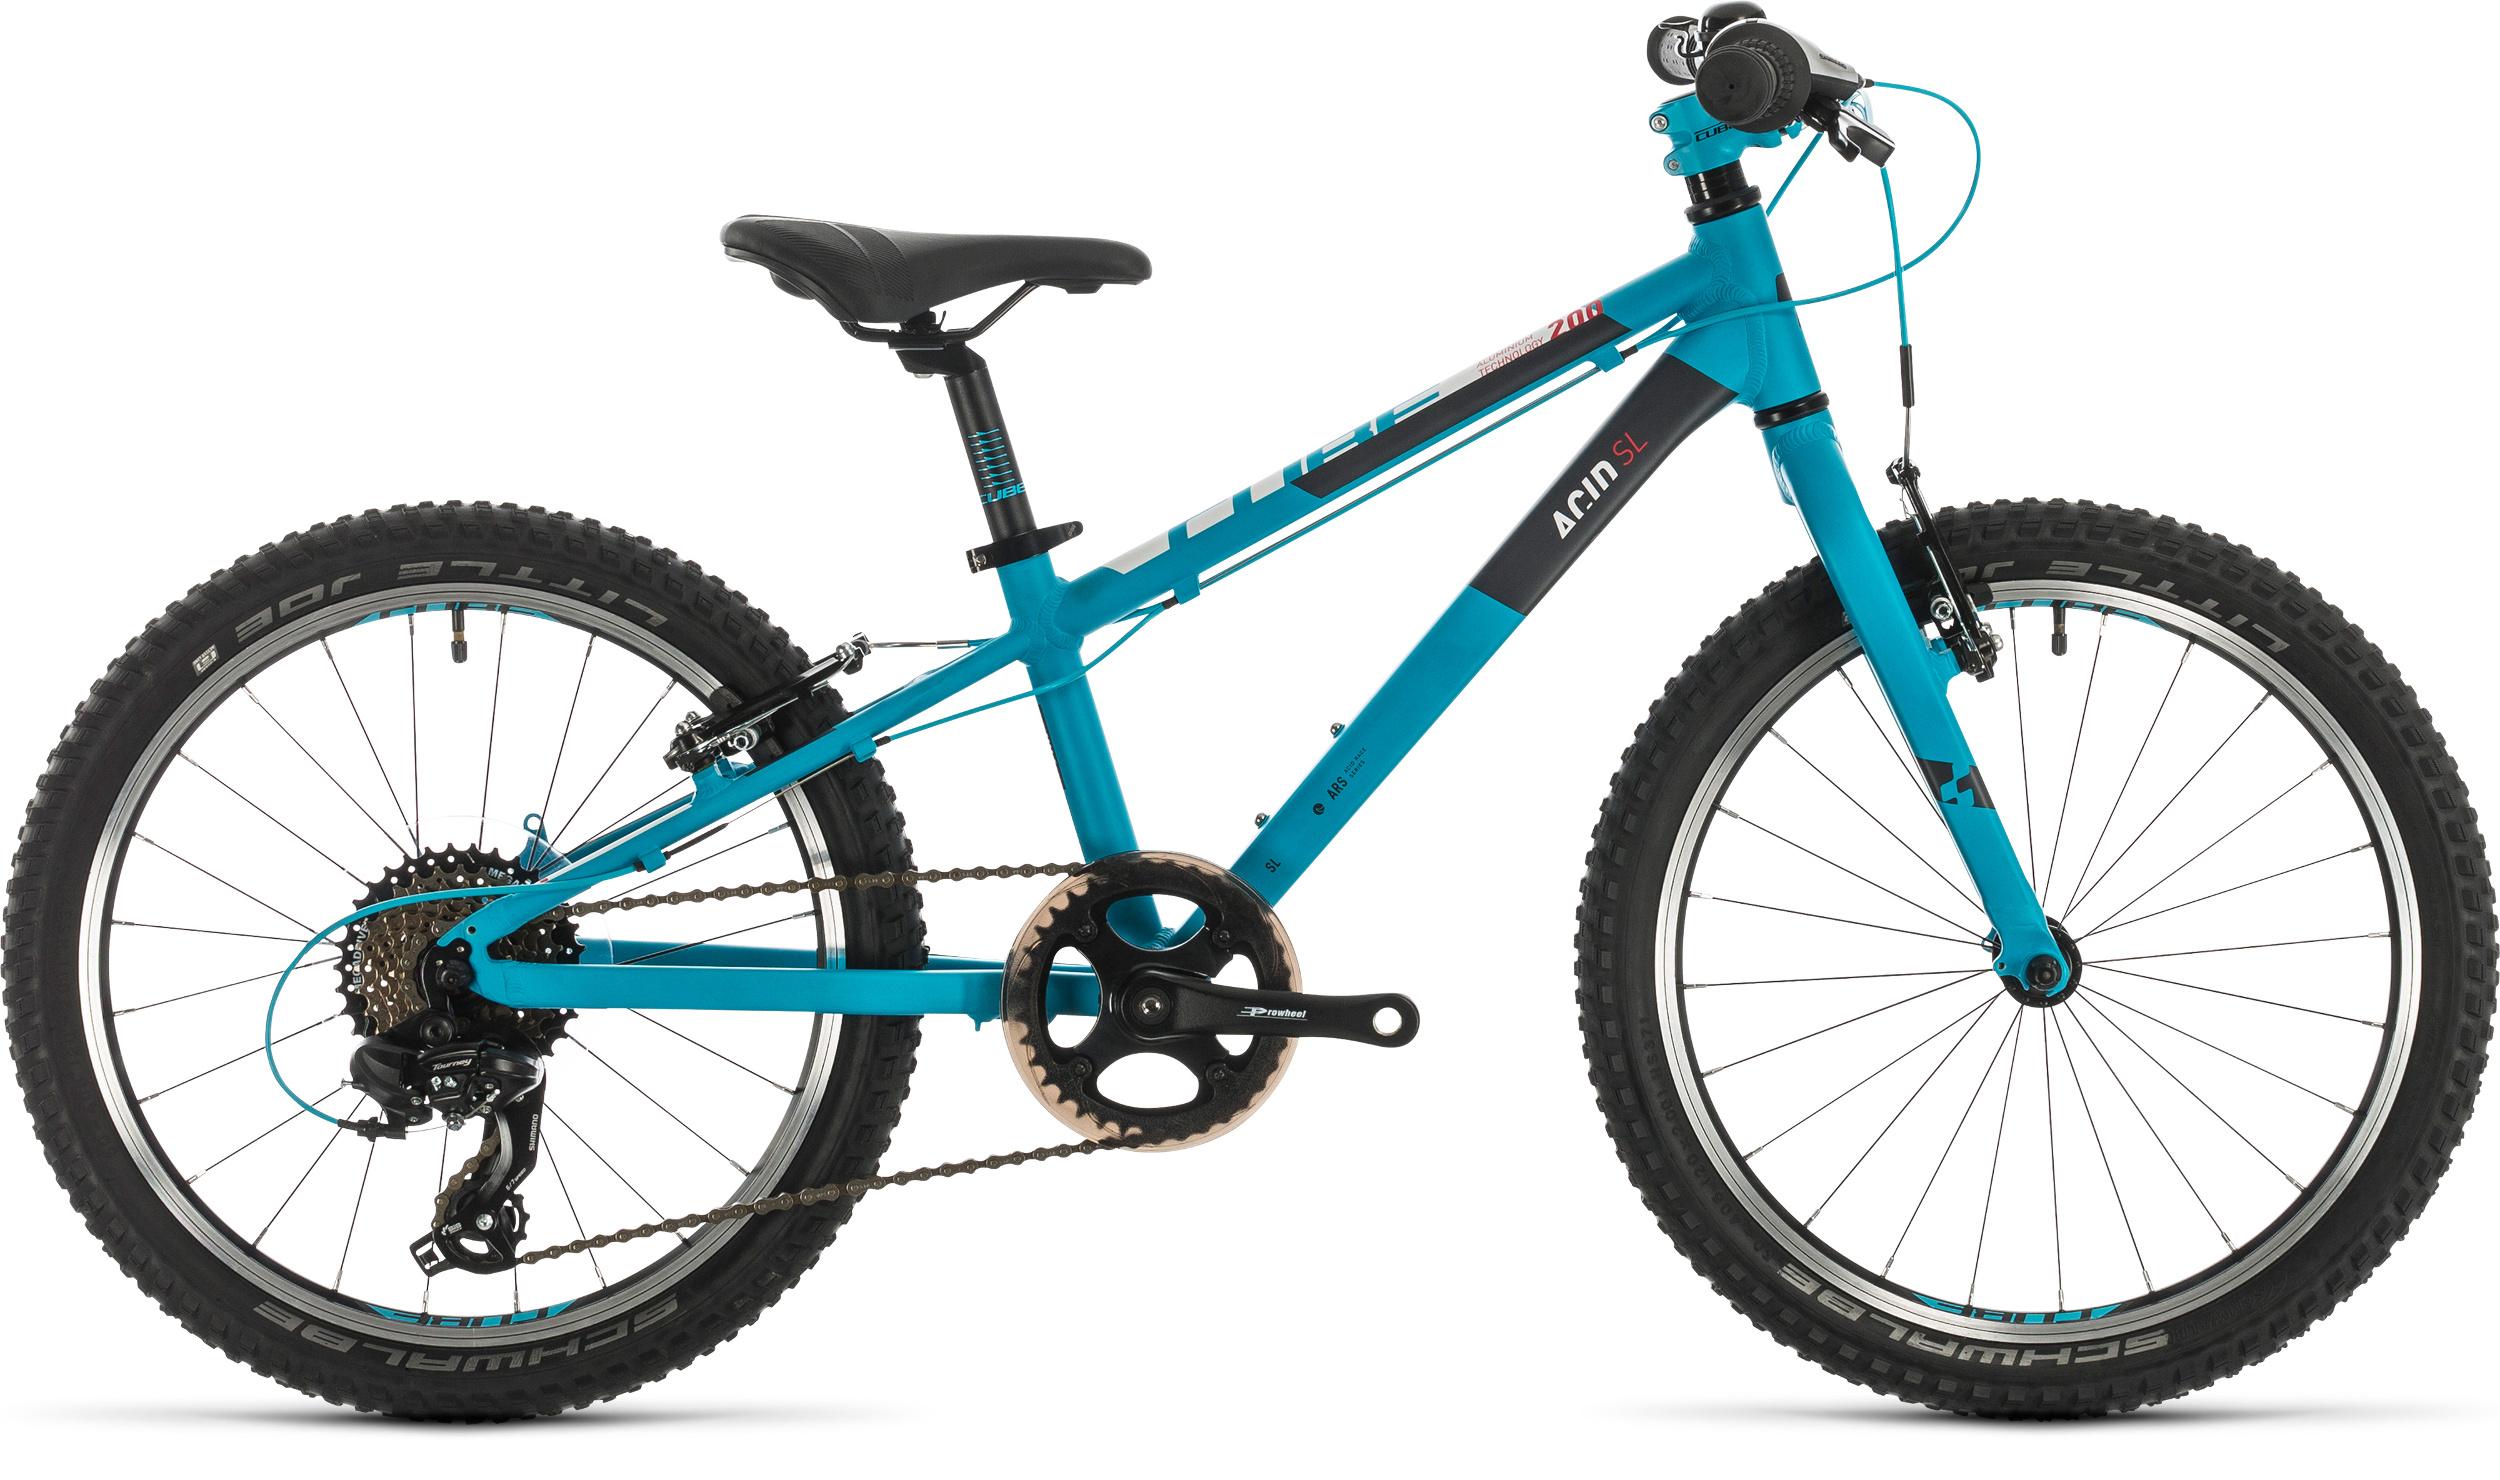 Cube Acid 200 SL 20in Wheel Kids Bike 2020 Turquoise/White